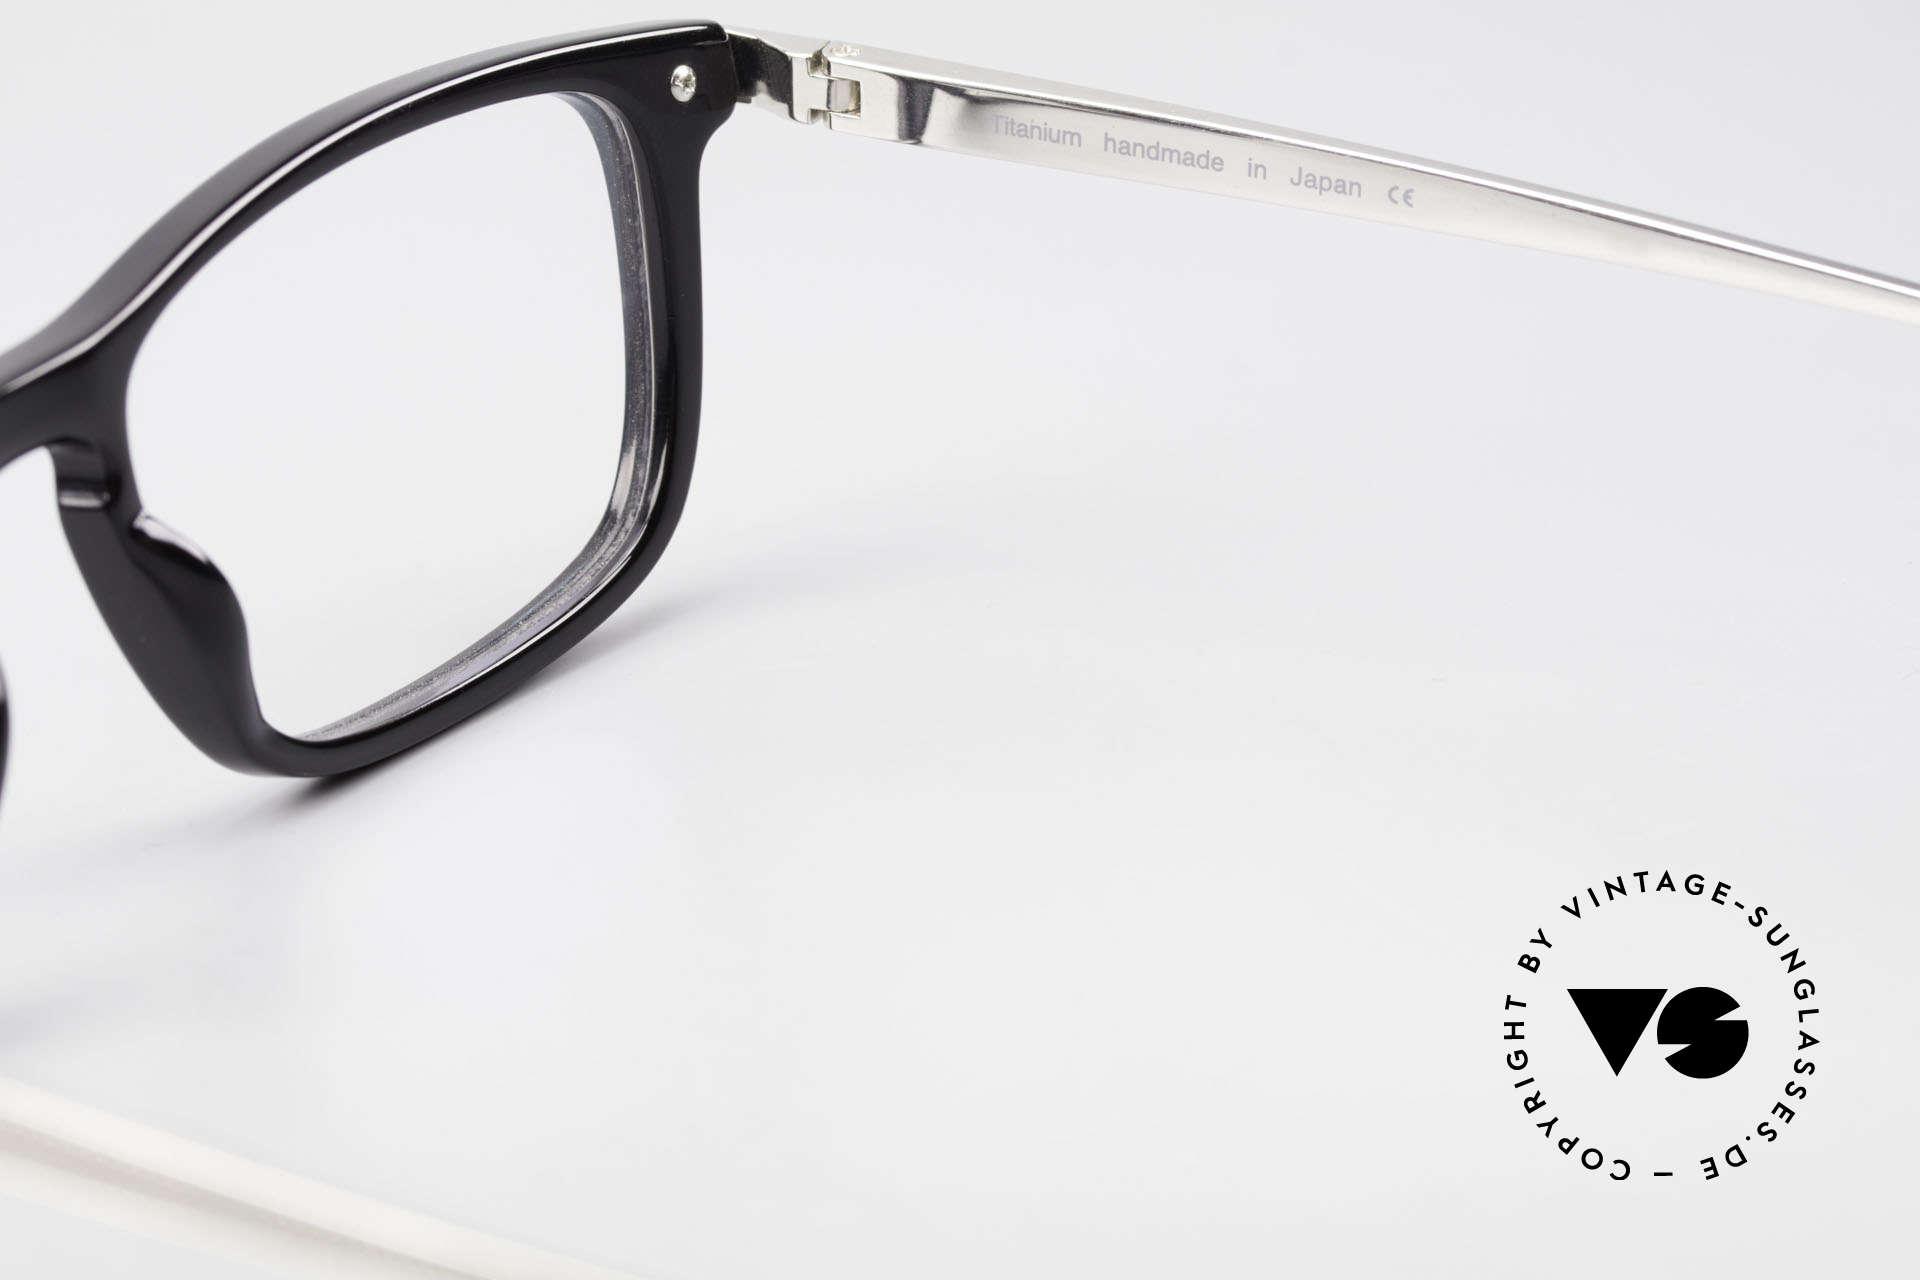 Lunor Imperial Anatomic Vintage Titanium Frame 2012, Size: medium, Made for Men and Women